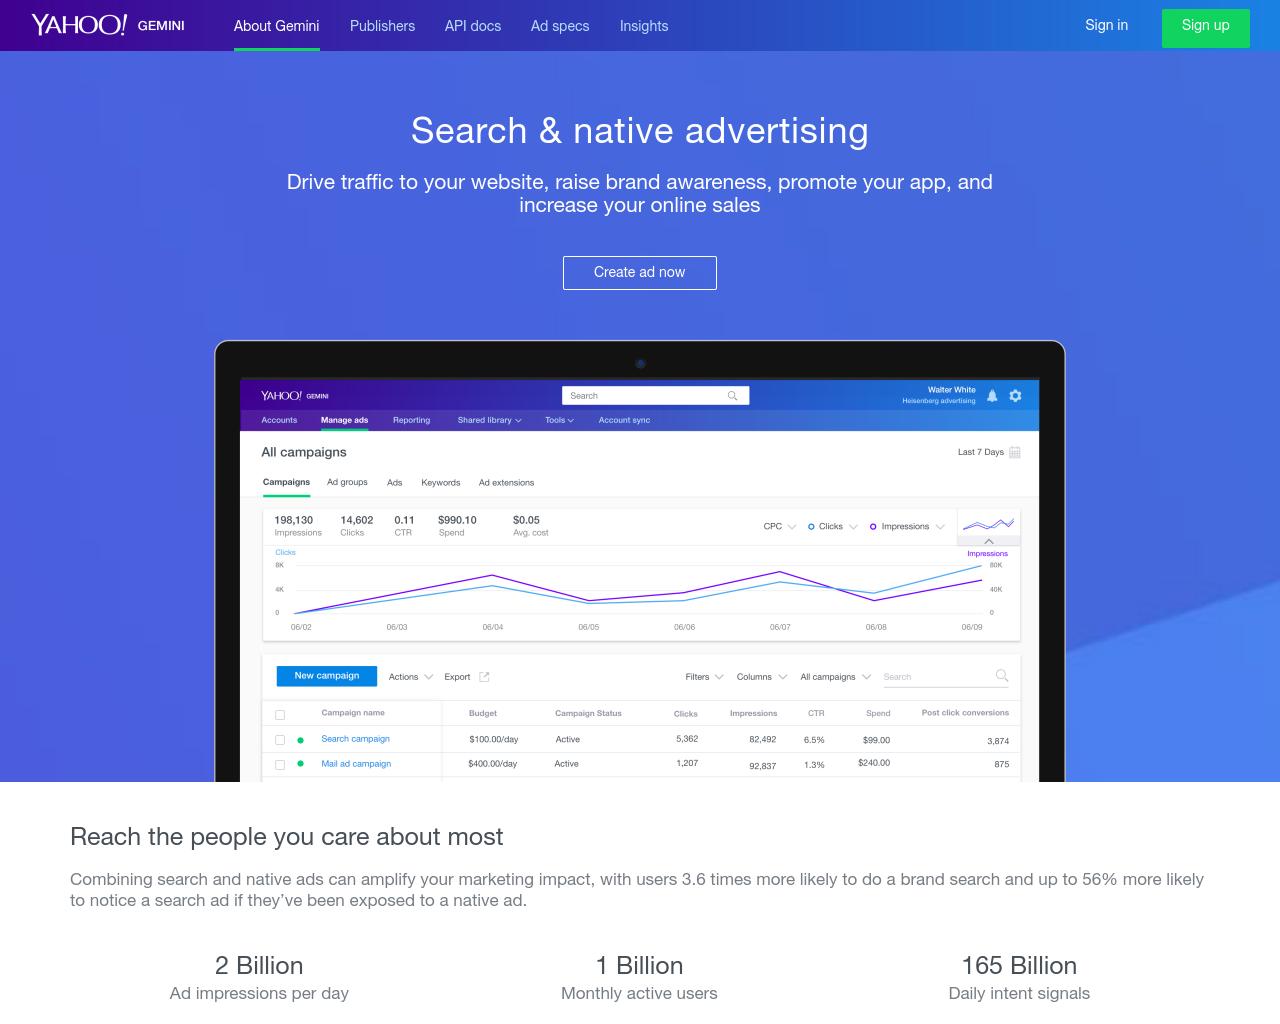 Yahoo!-Gemini-Advertising-Reviews-Pricing